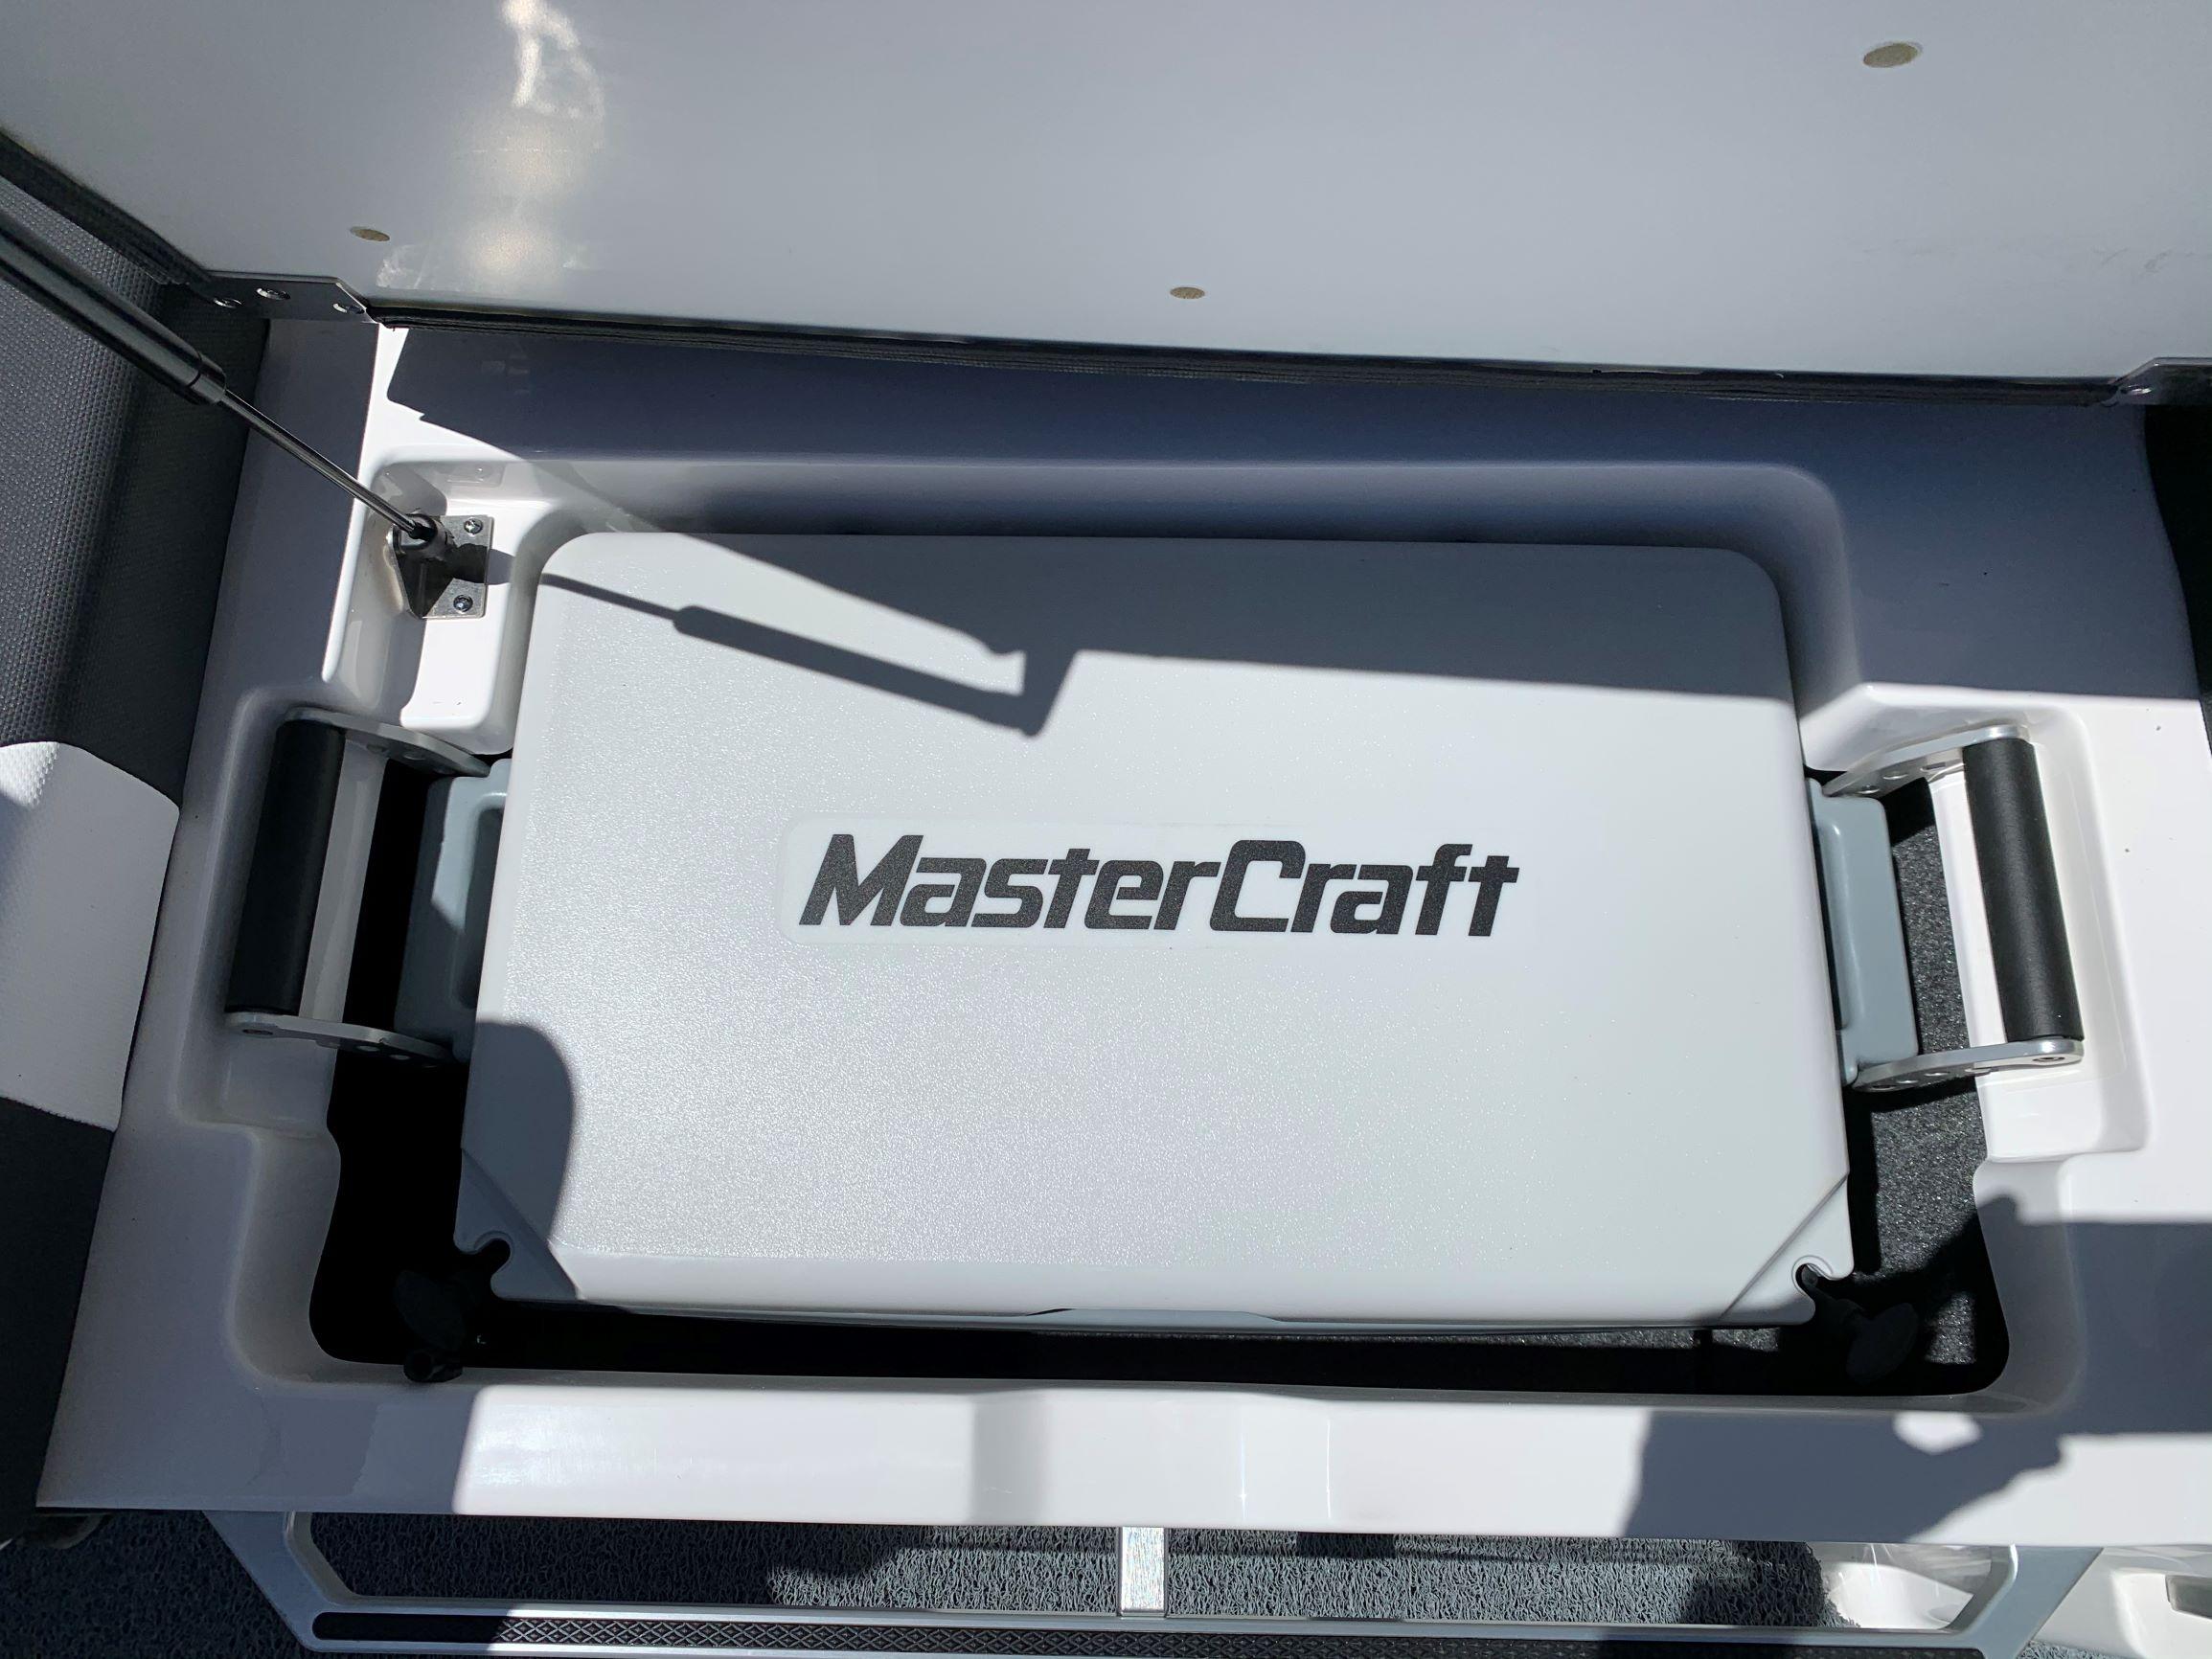 2020 MasterCraft XSTAR - White/Midnight Black Image 23